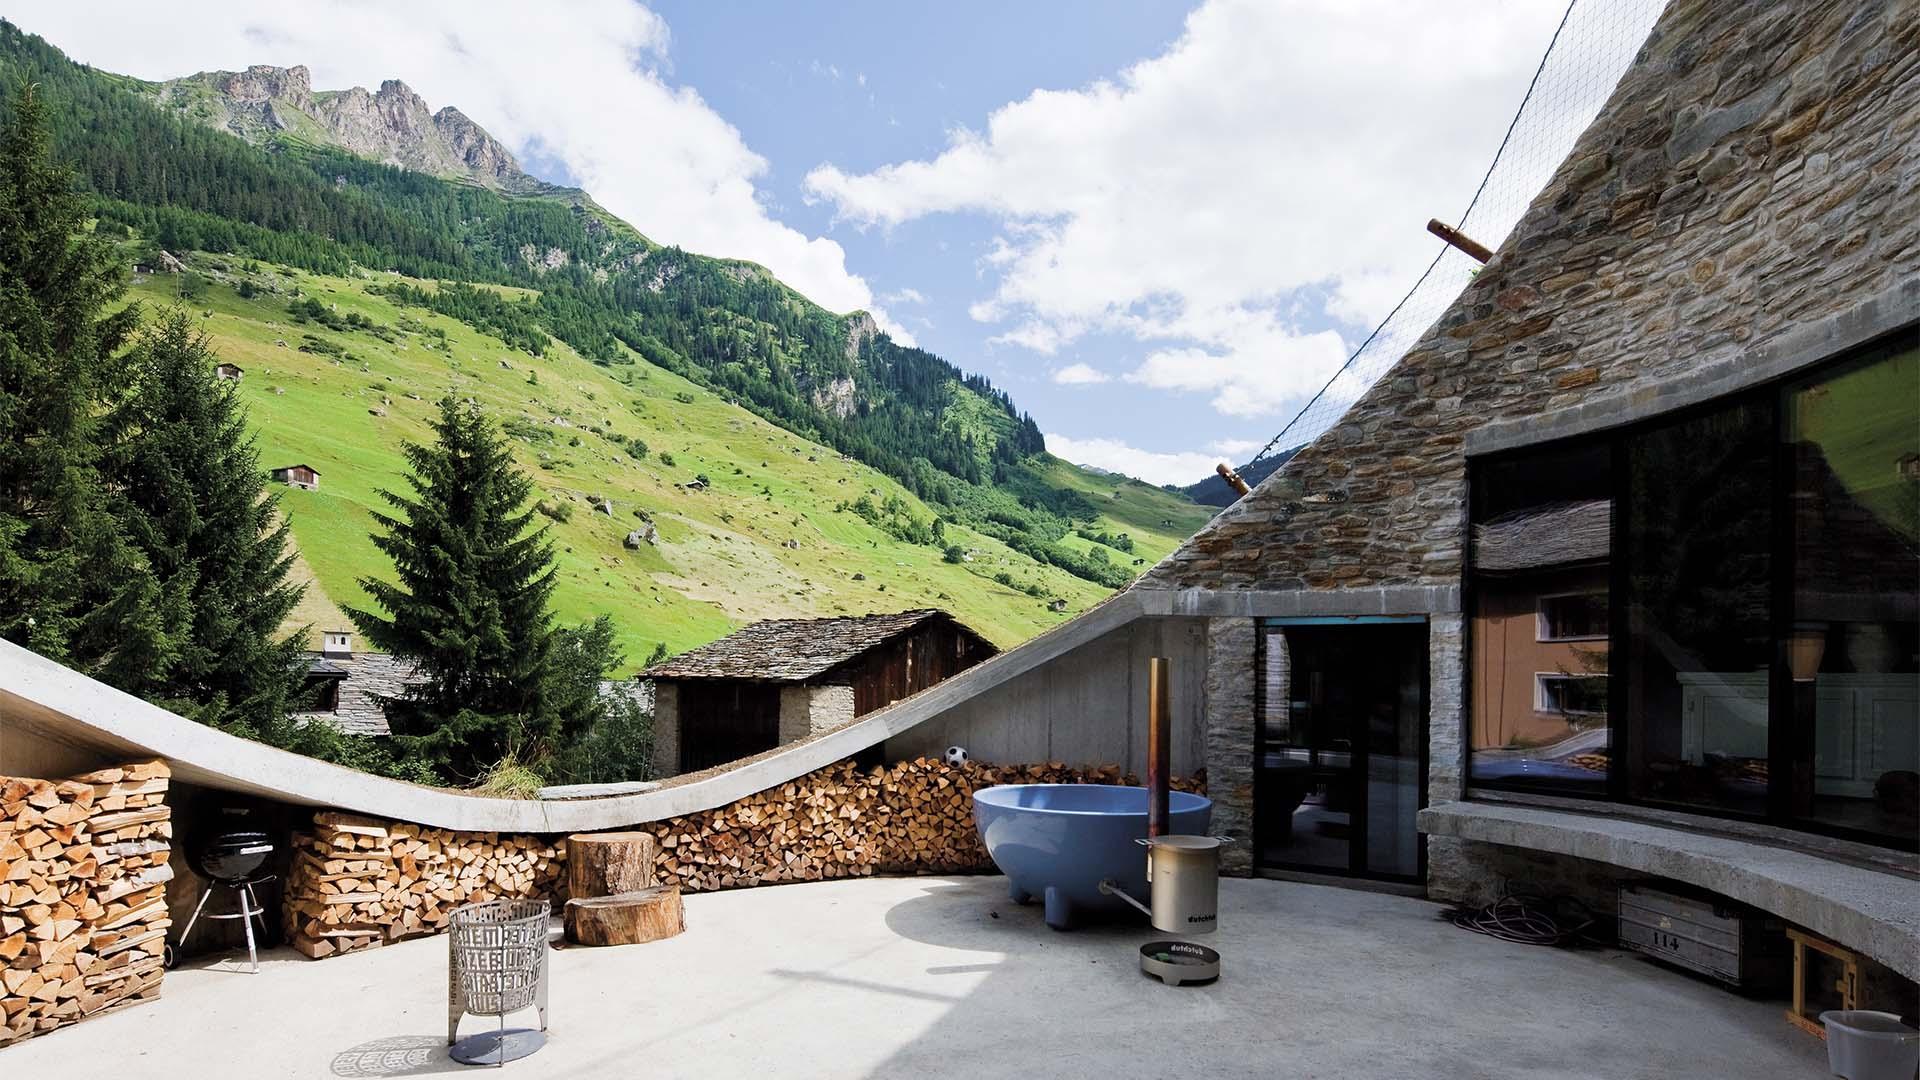 Exterior of Villa Vals in Switzerland